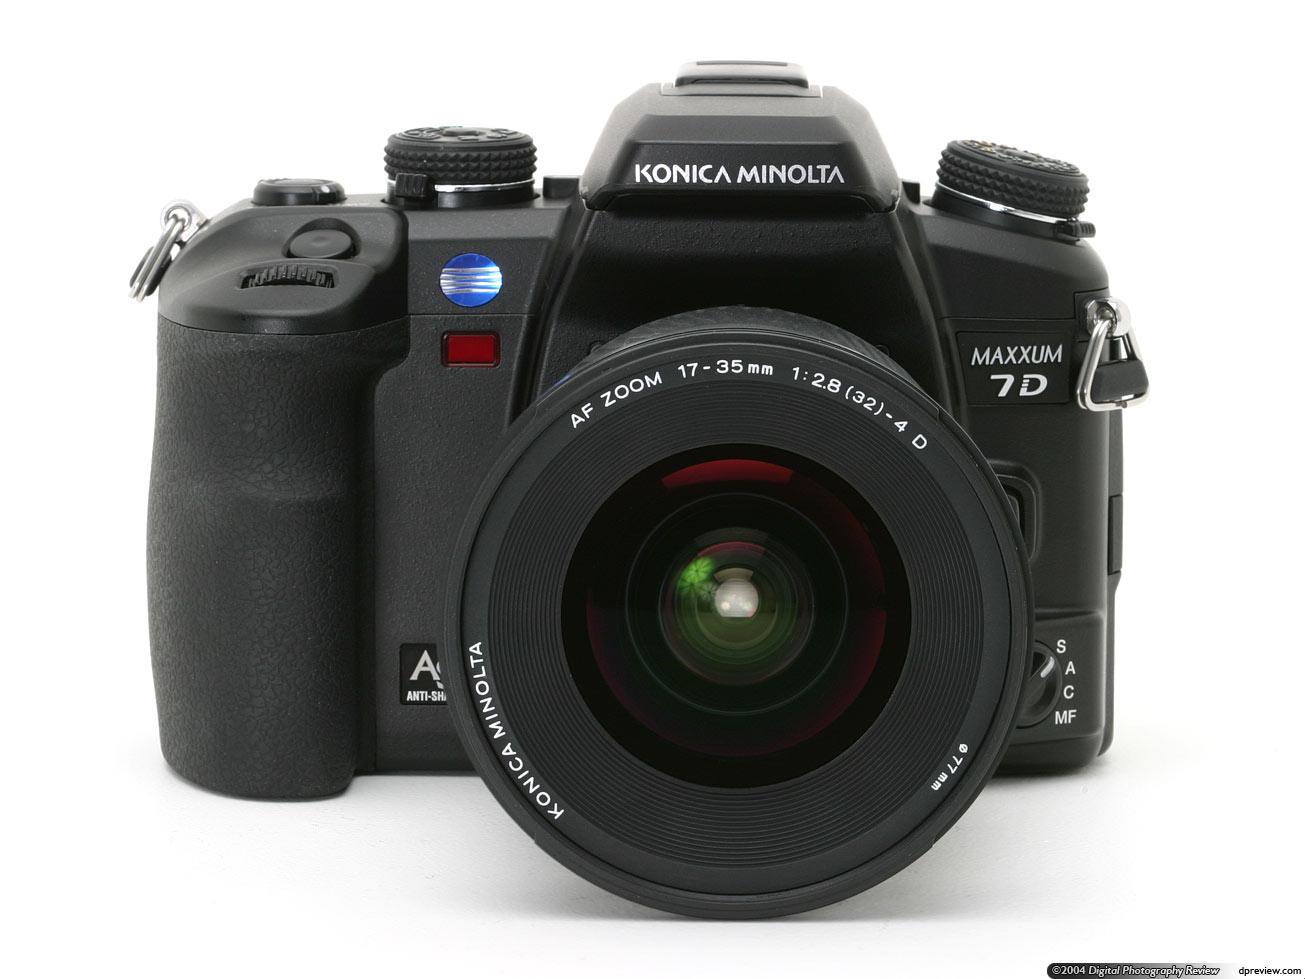 konica minolta maxxum 7d review - Minolta Digital Camera